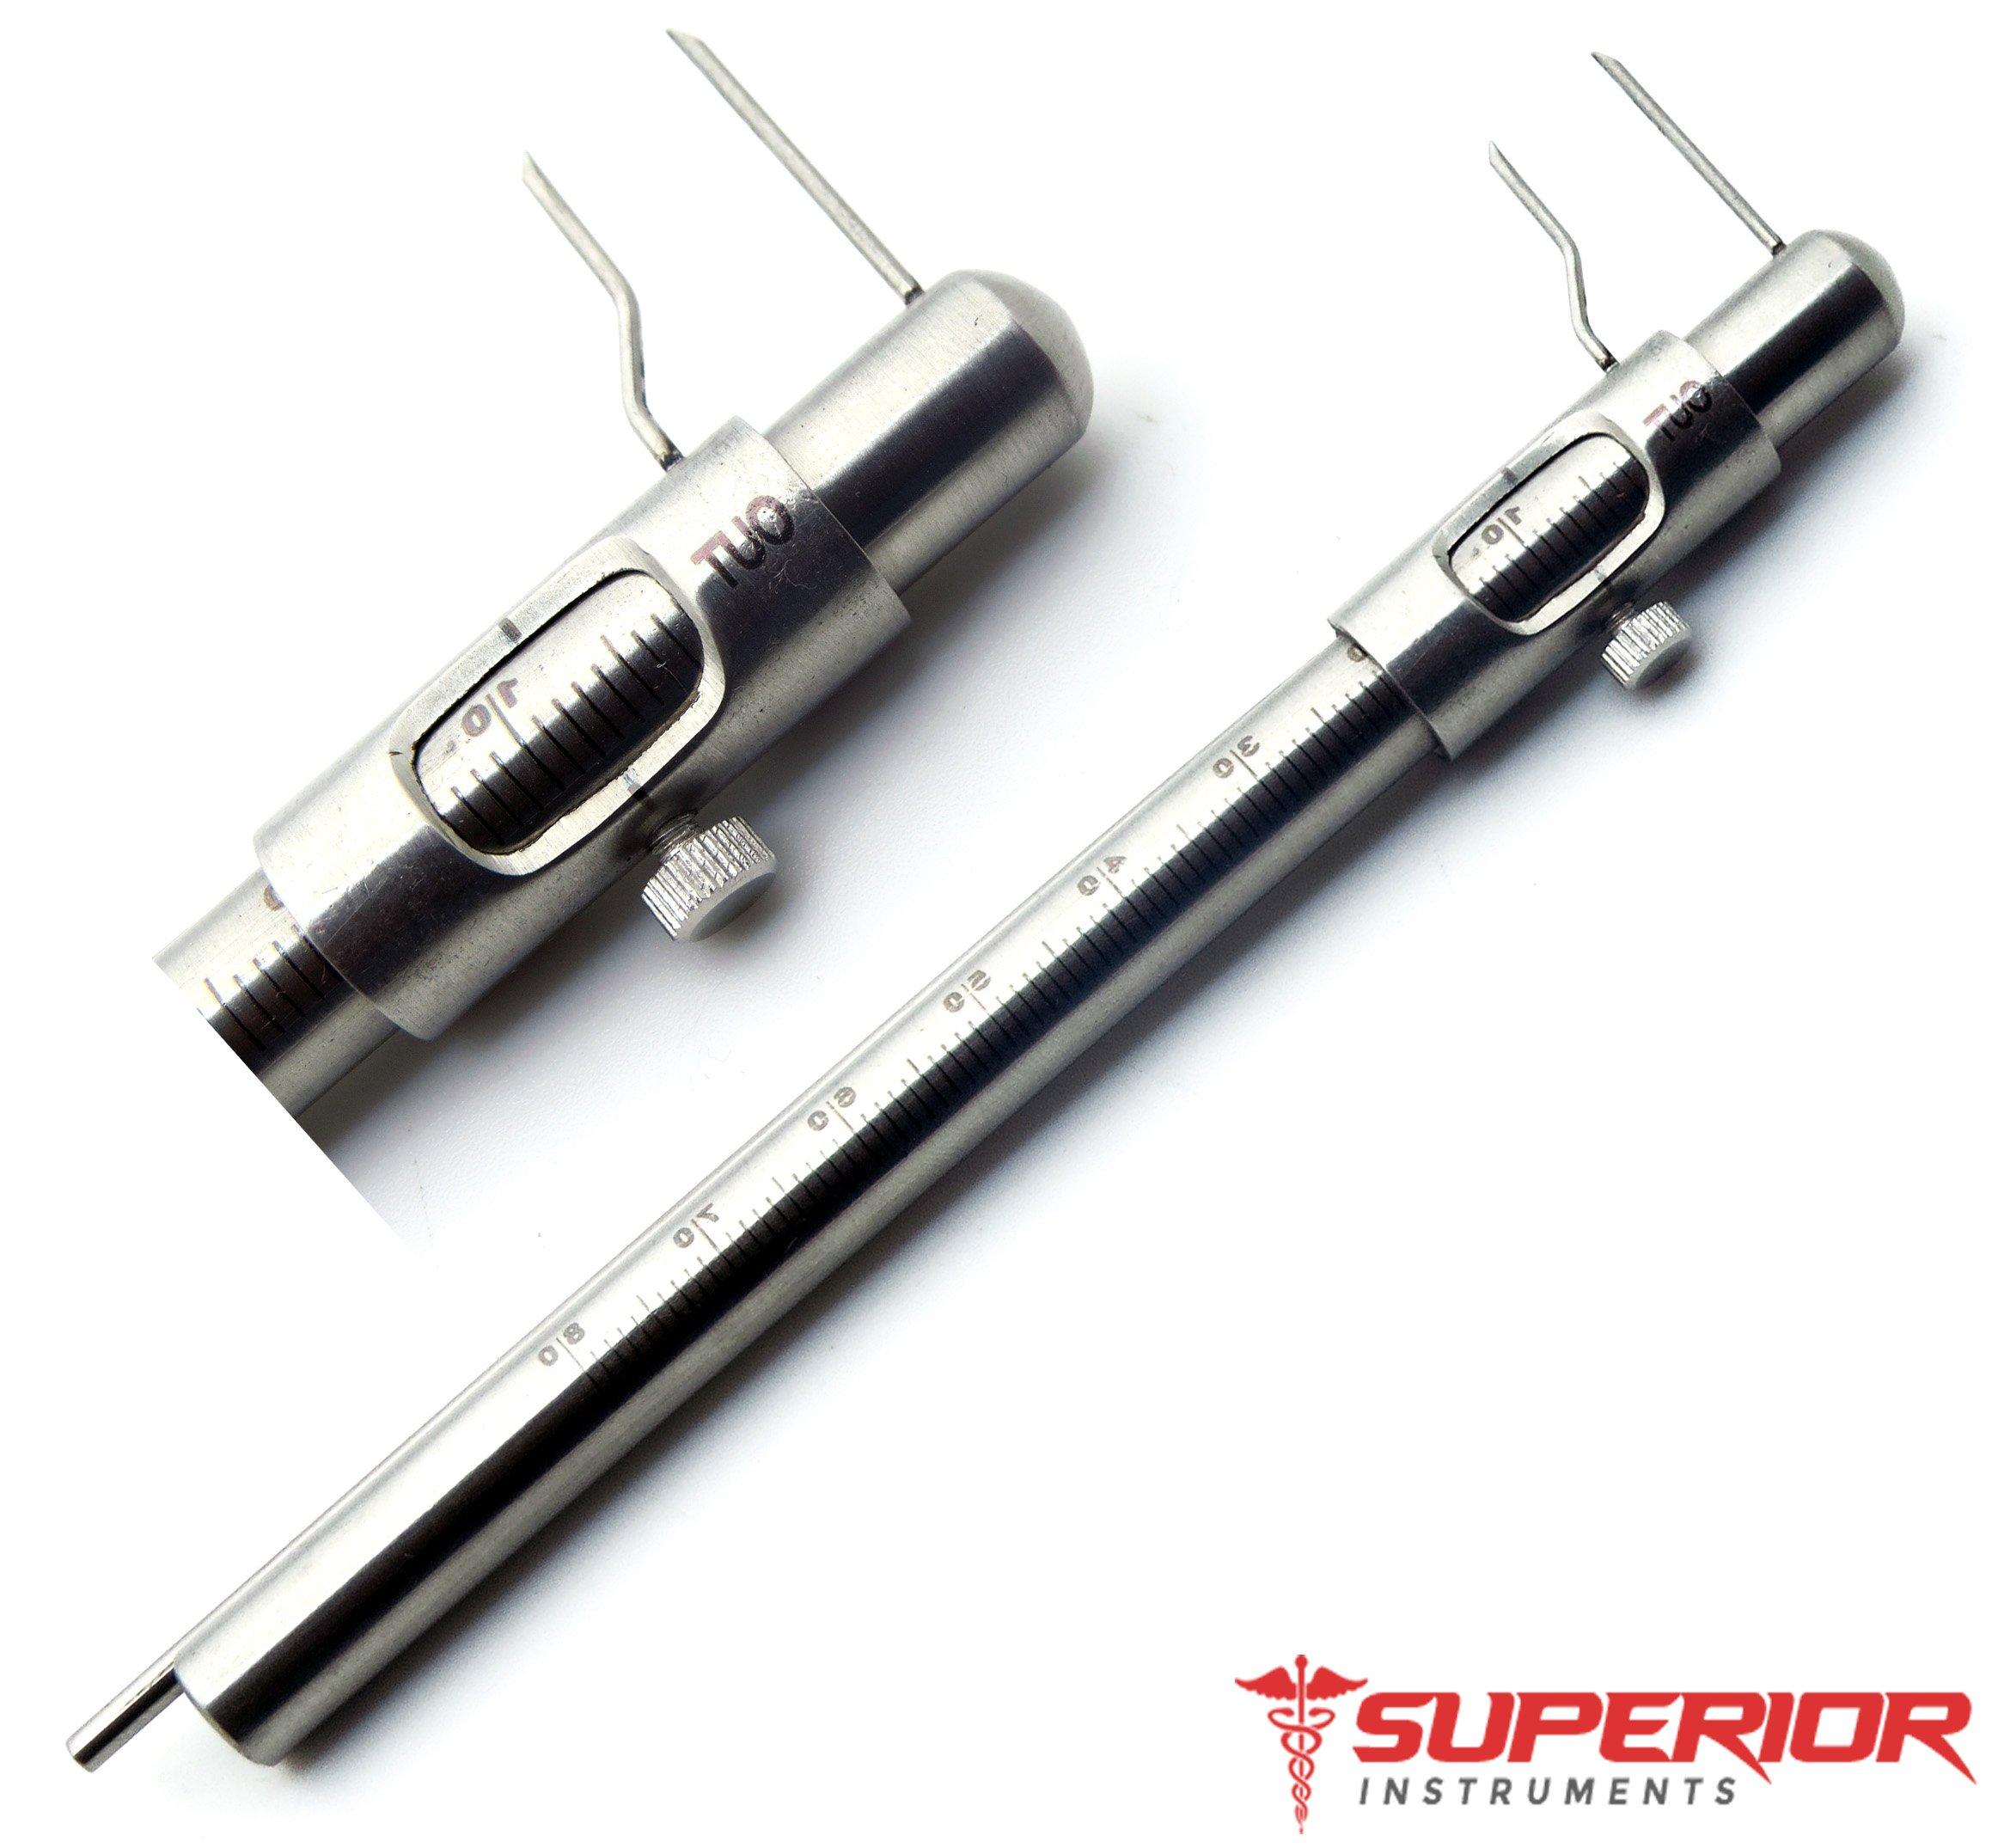 Micro Boley Gauge Material Teeth Size Measurement Restorative Dental Stainless Steel Instruments